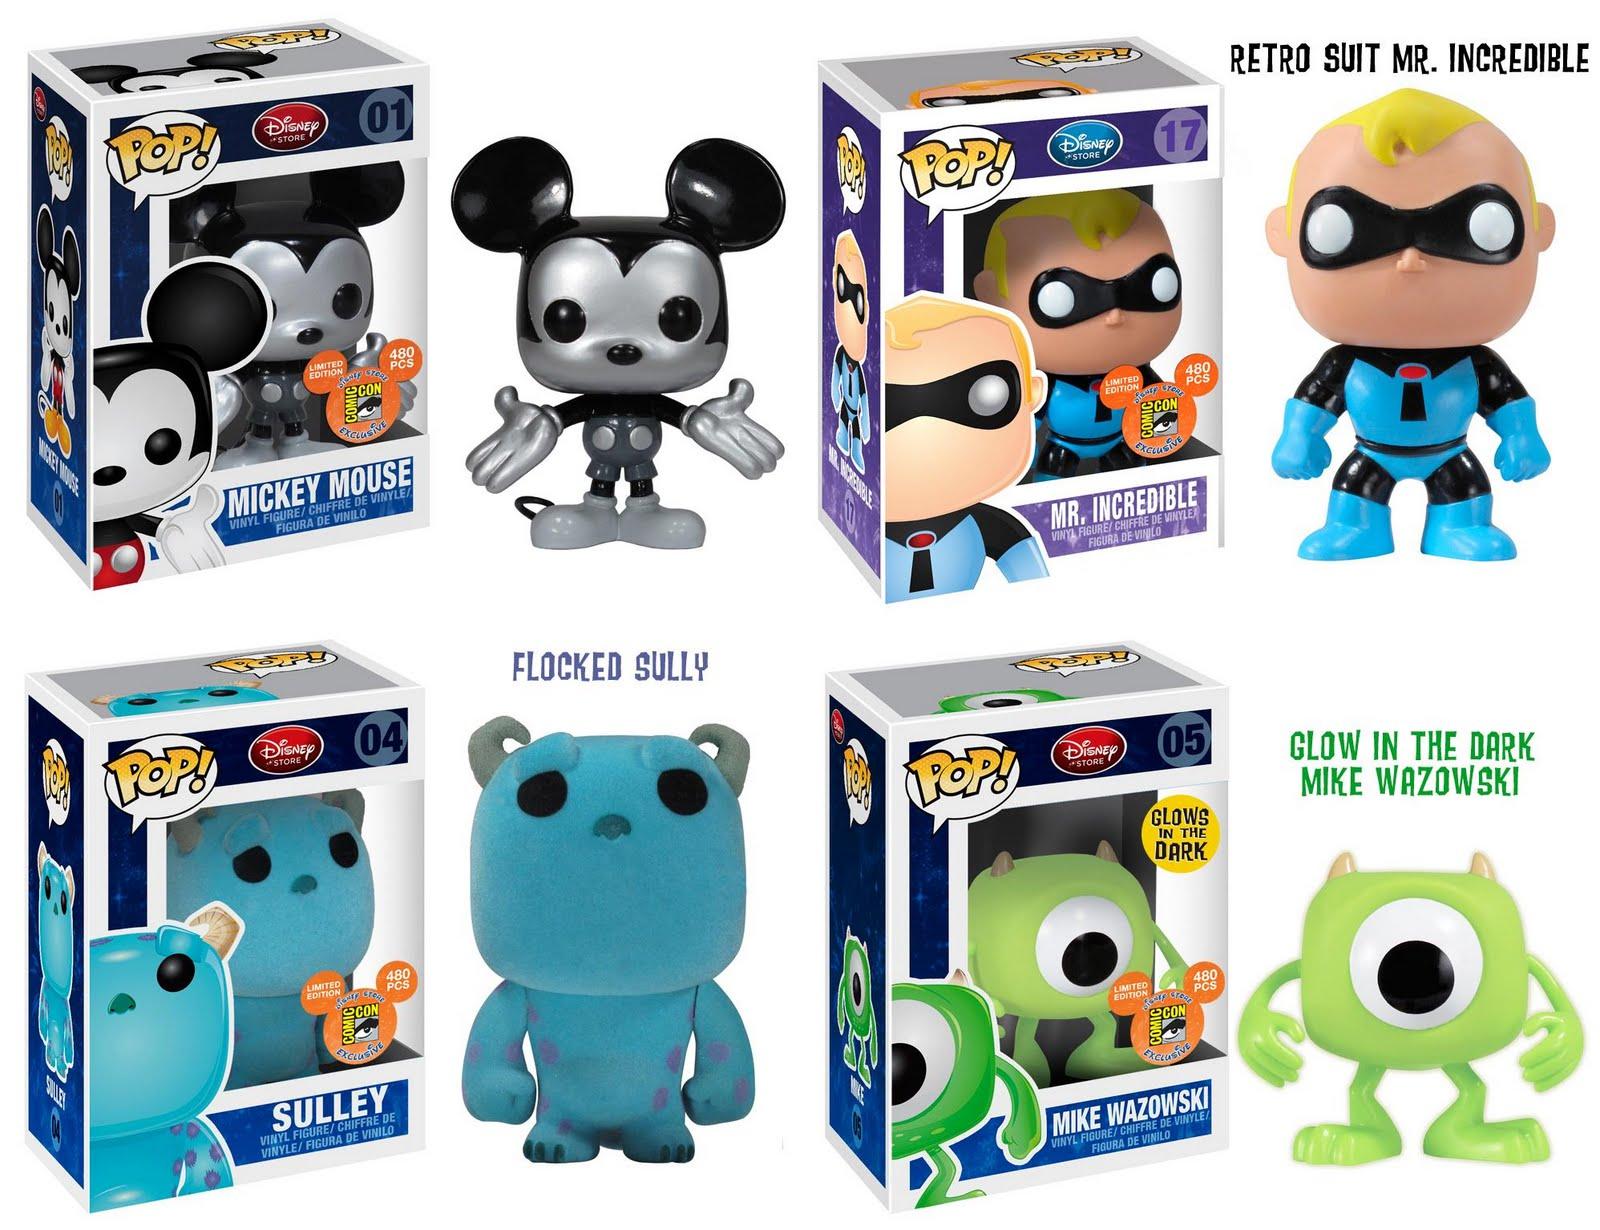 The Blot Says Sdcc 2011 Exclusive Pop Disney Store Vinyl Funko Comics Hellboy In Suit San Diego Comic Con Figures Metallic Mono Mickey